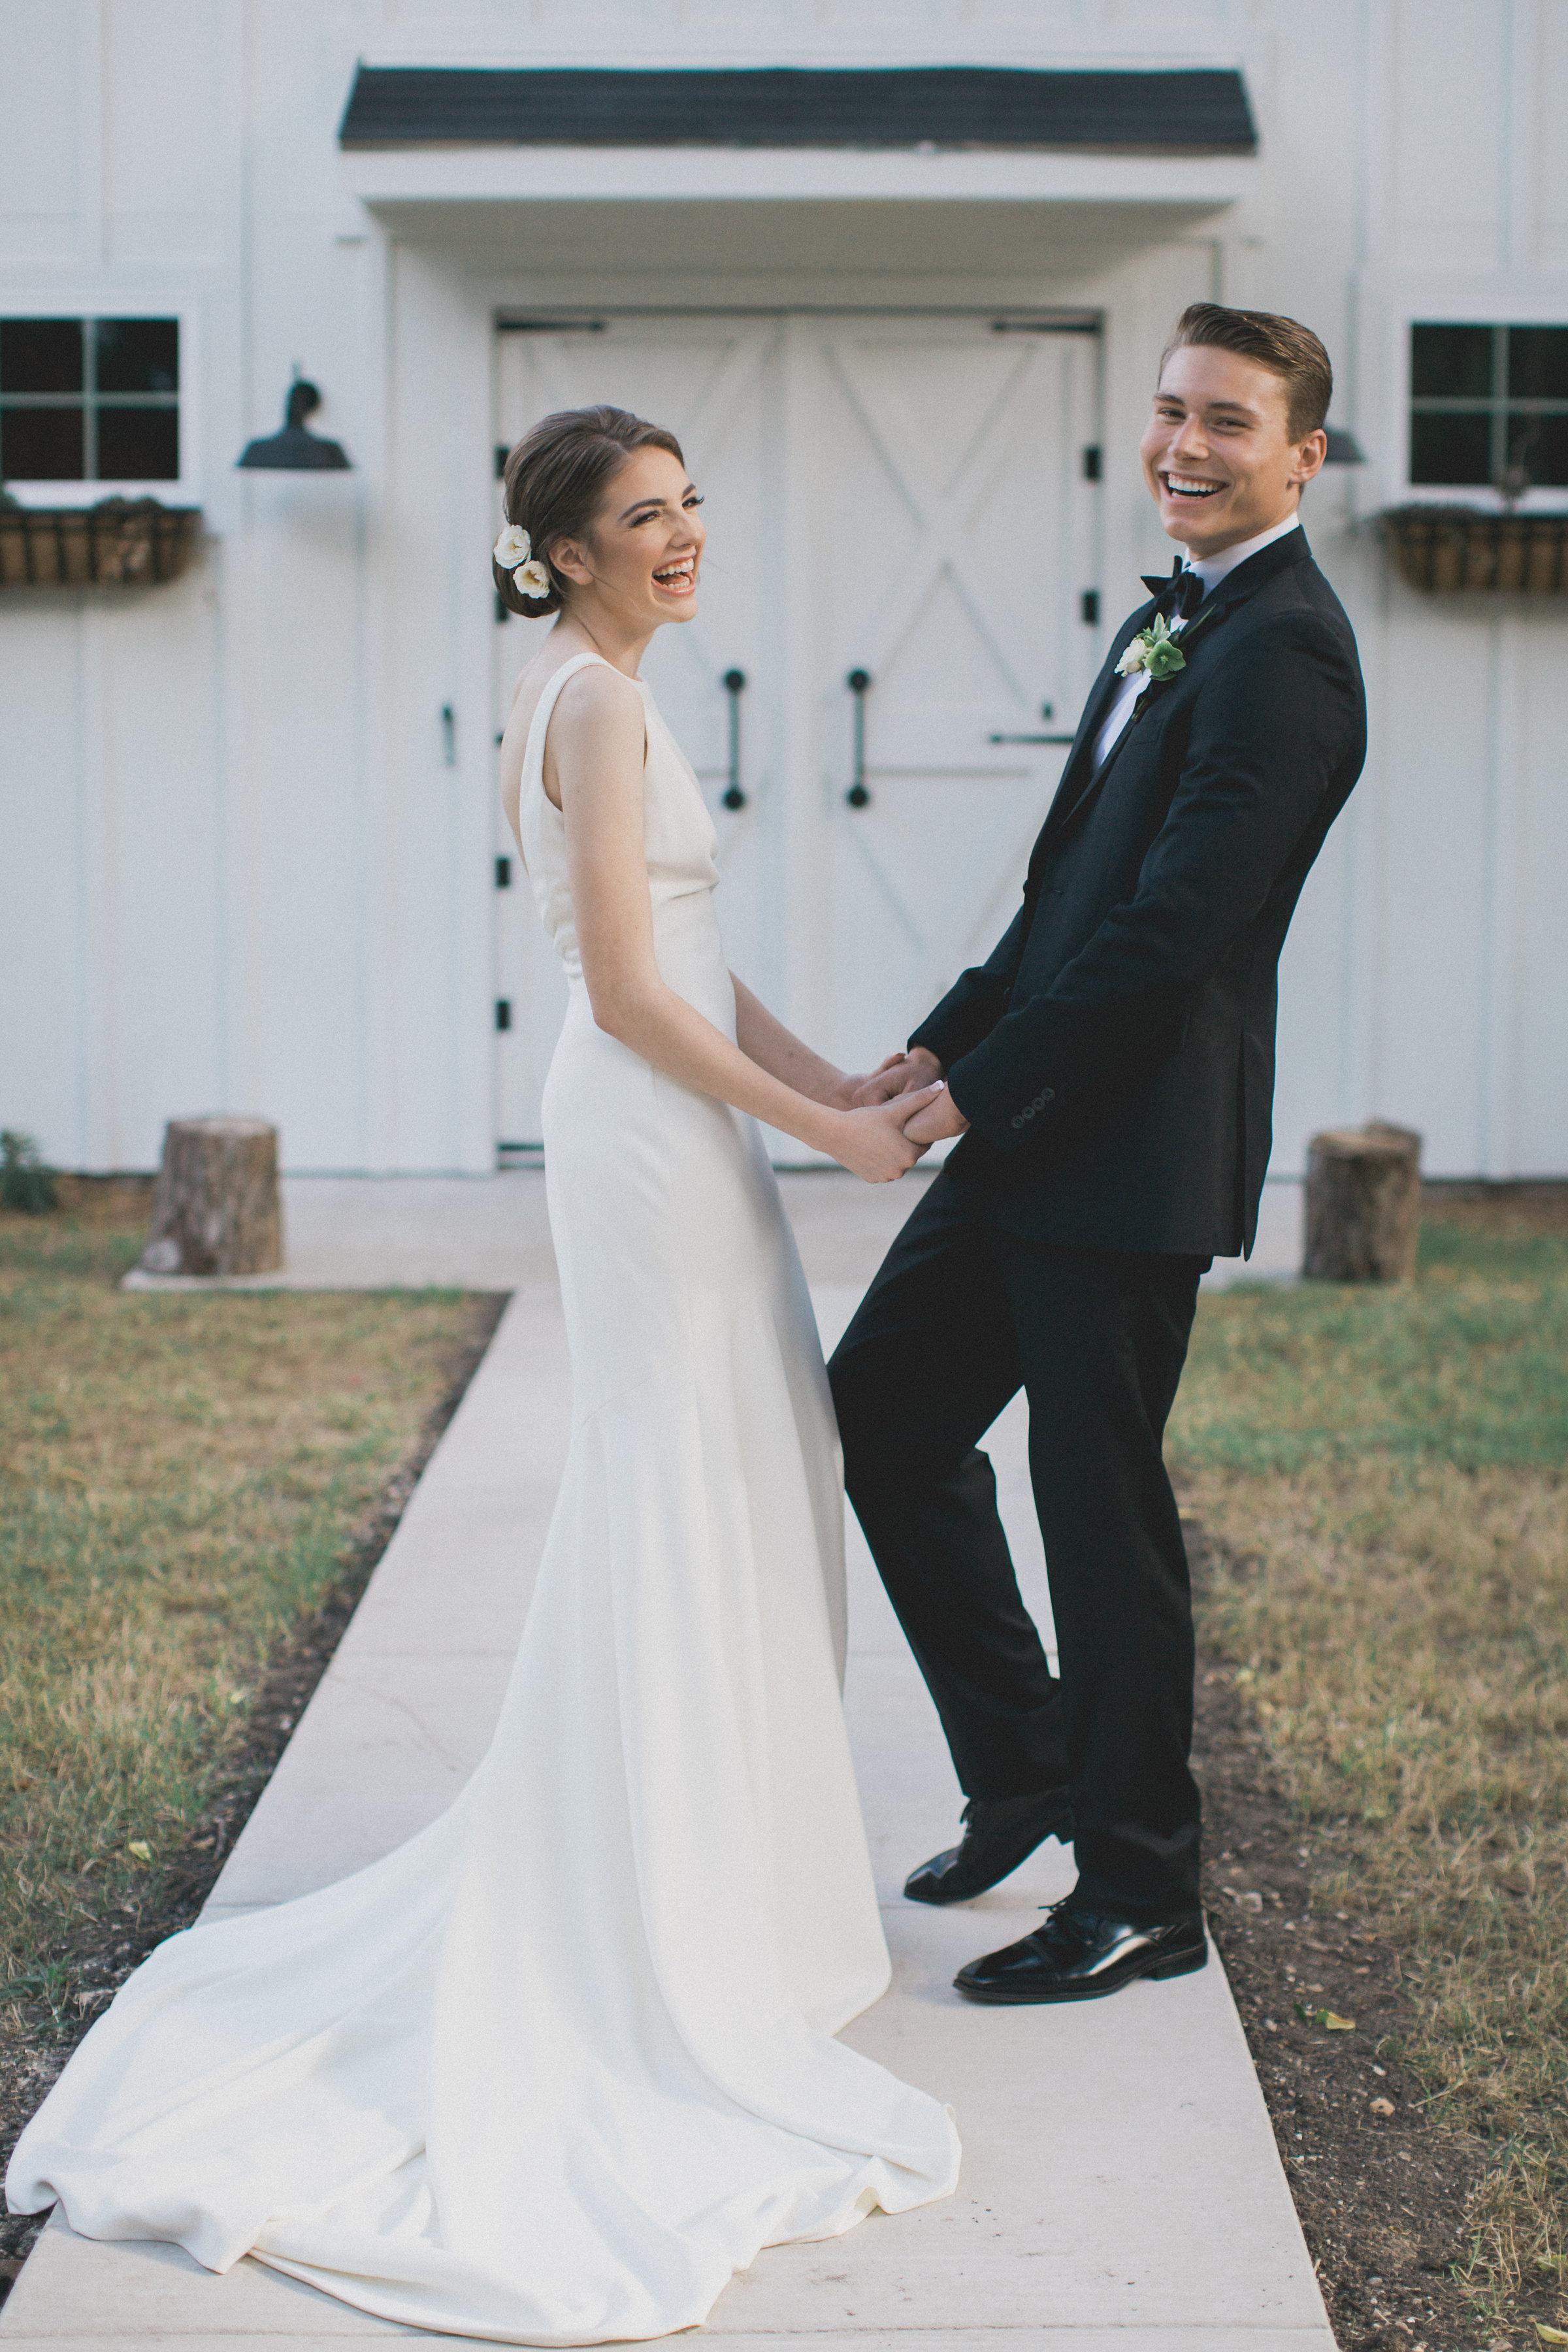 Outdoor Summer Wedding | Southern Summer White Barn Wedding in Dallas, TX